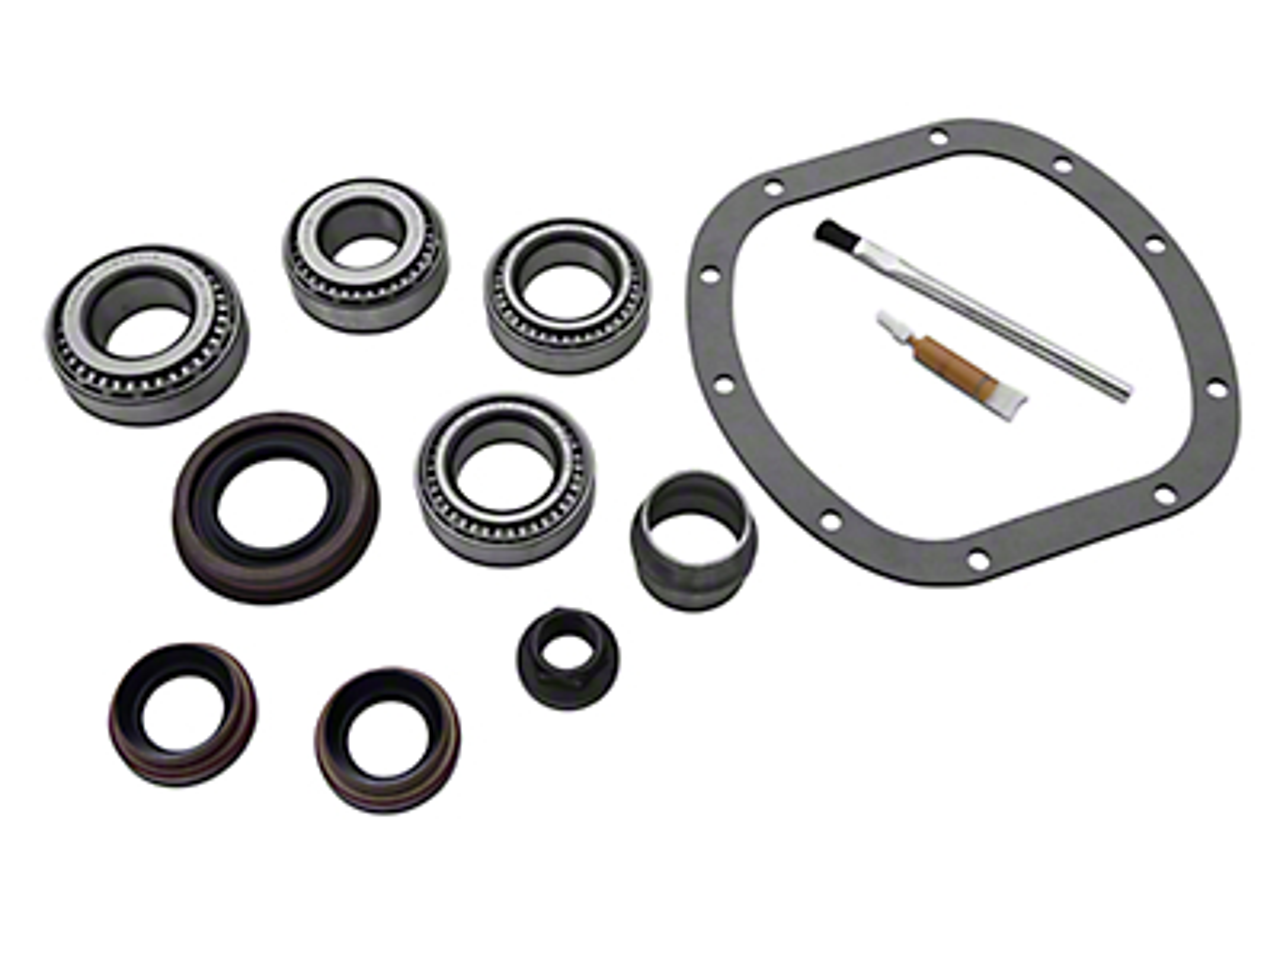 Yukon Gear Front Dana 30 Bearing Install Kit (07-18 Wrangler JK, Excluding Rubicon)